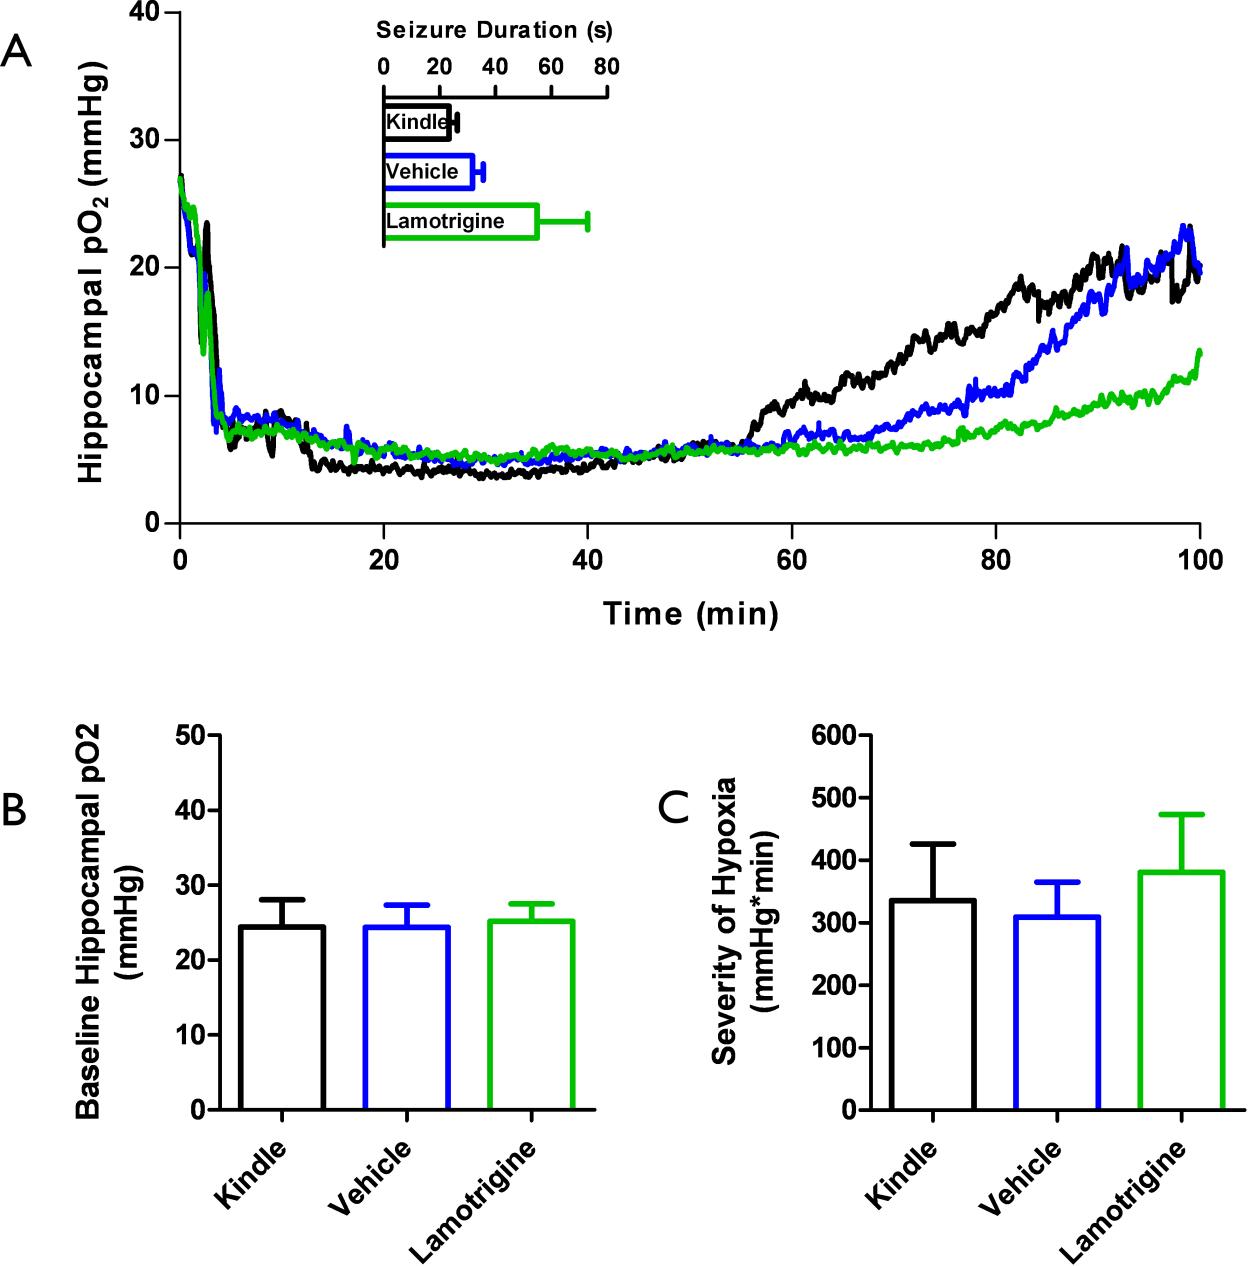 Figure 4-8: Seizure induced hypoxia and seizure durations post-lamotrigine